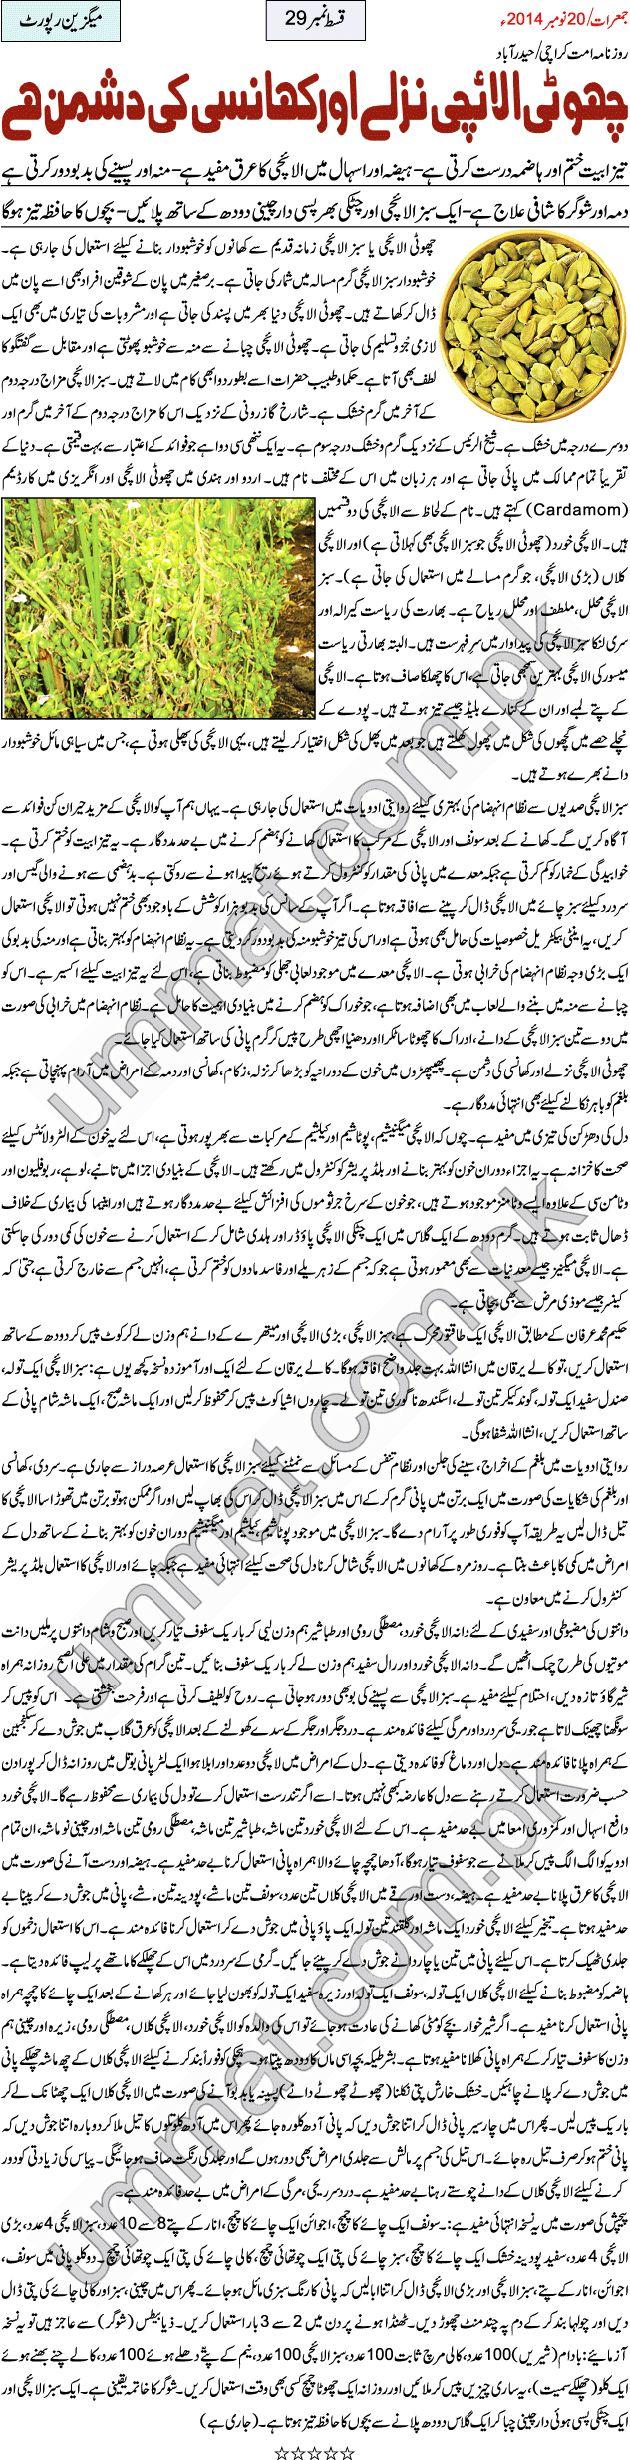 Daily Publications | Daily Ummat Karachi provides latest news in urdu language.